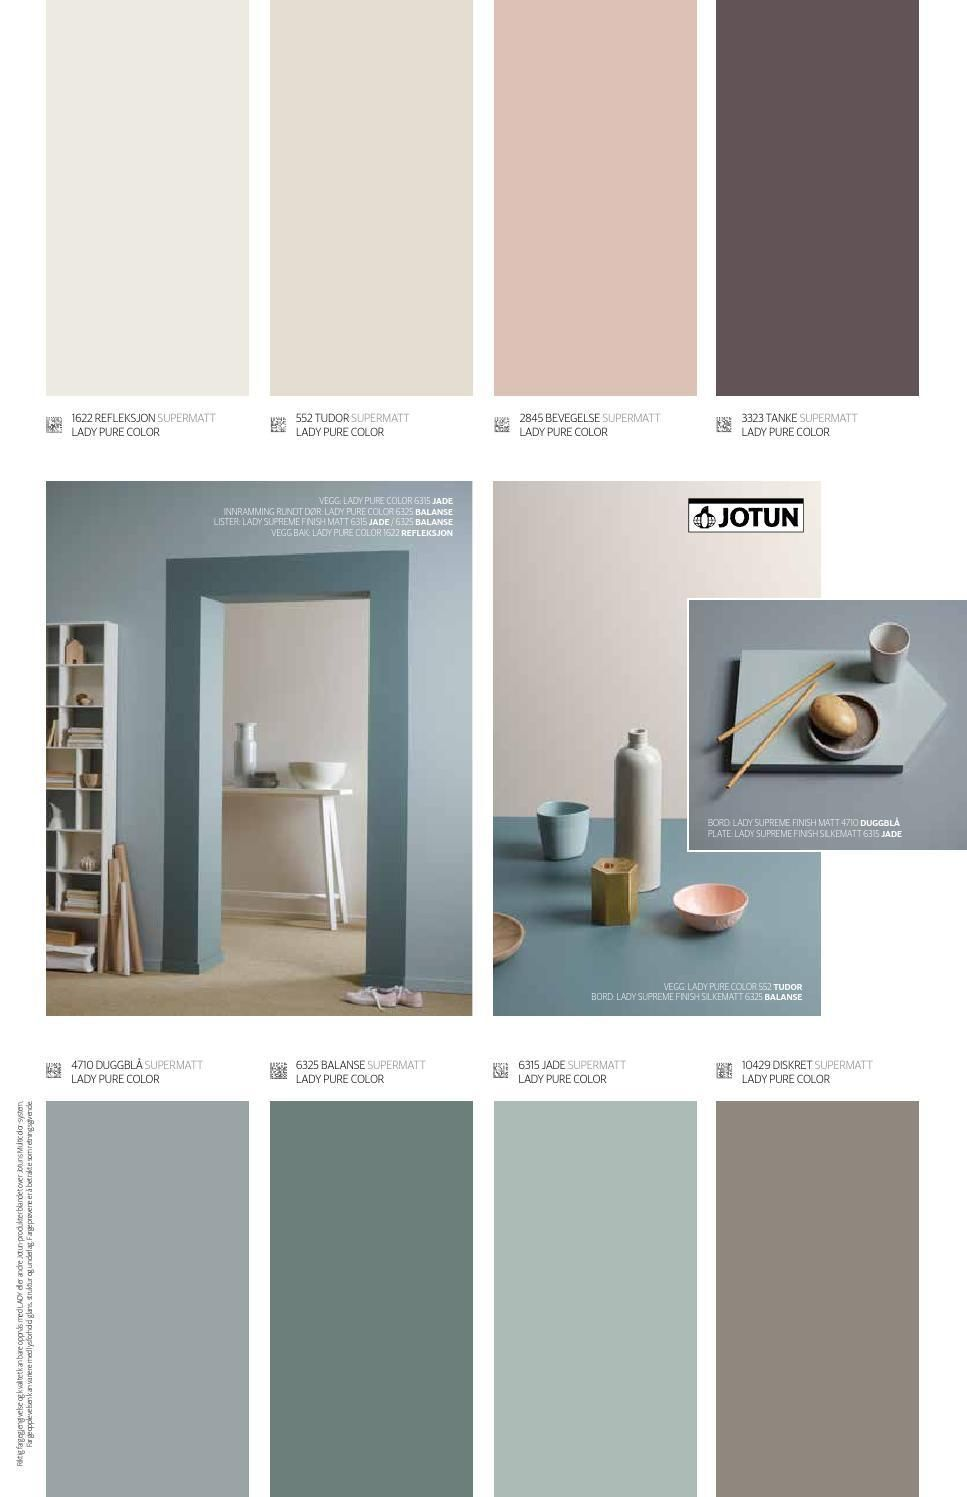 Photo of Jotun LADY Pure Color – Einrichtungsideen